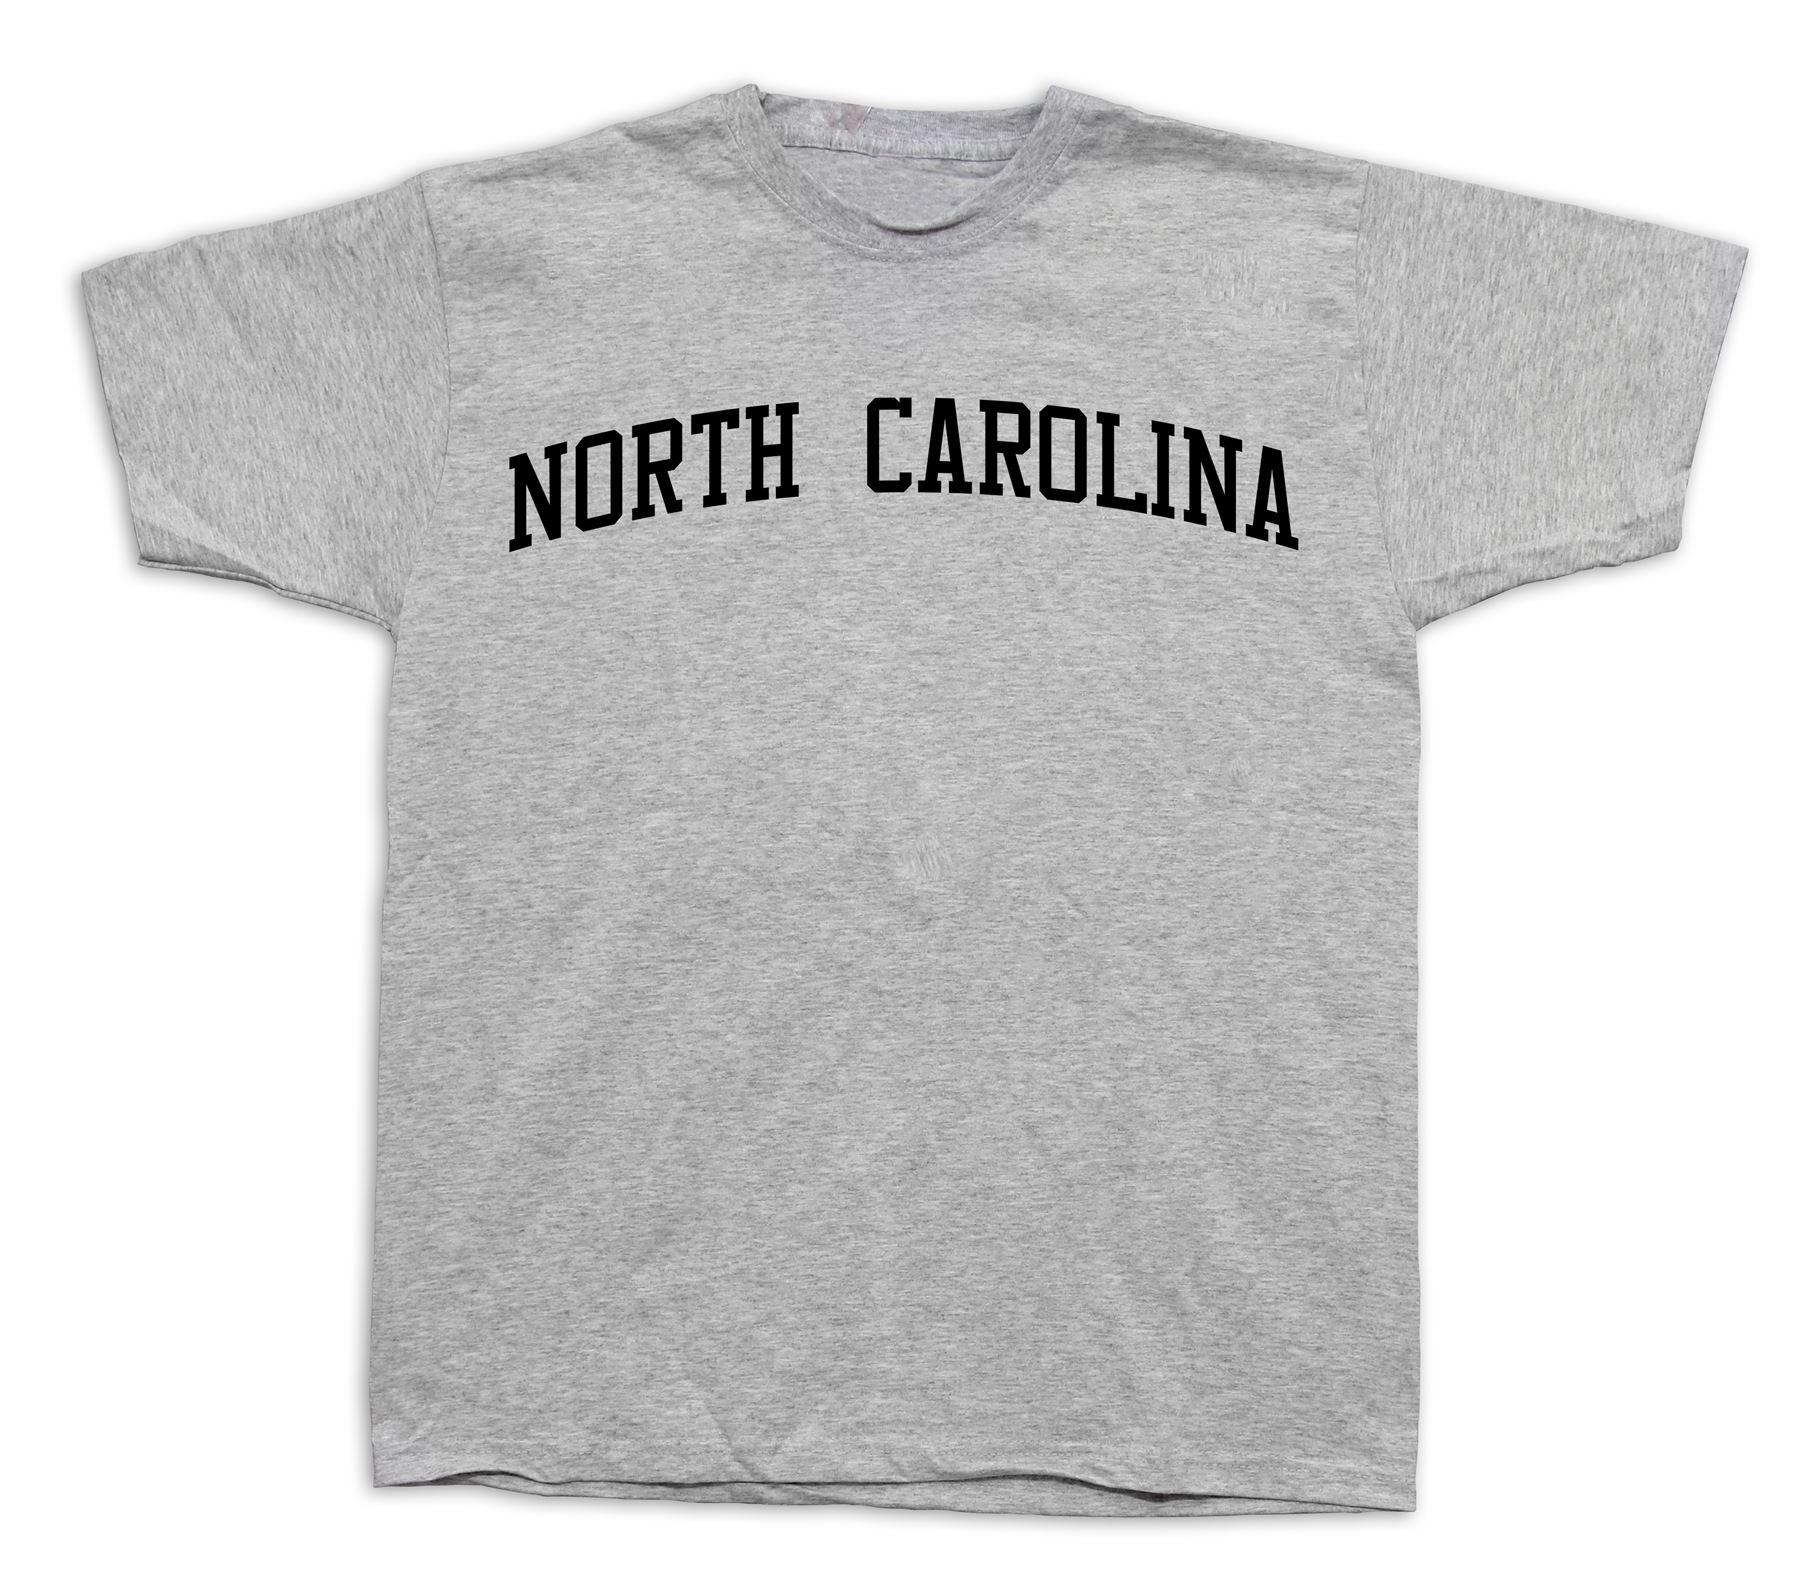 North Carolina Tar Heel First Fight State NC T-shirt University UNC ... 63bd63845